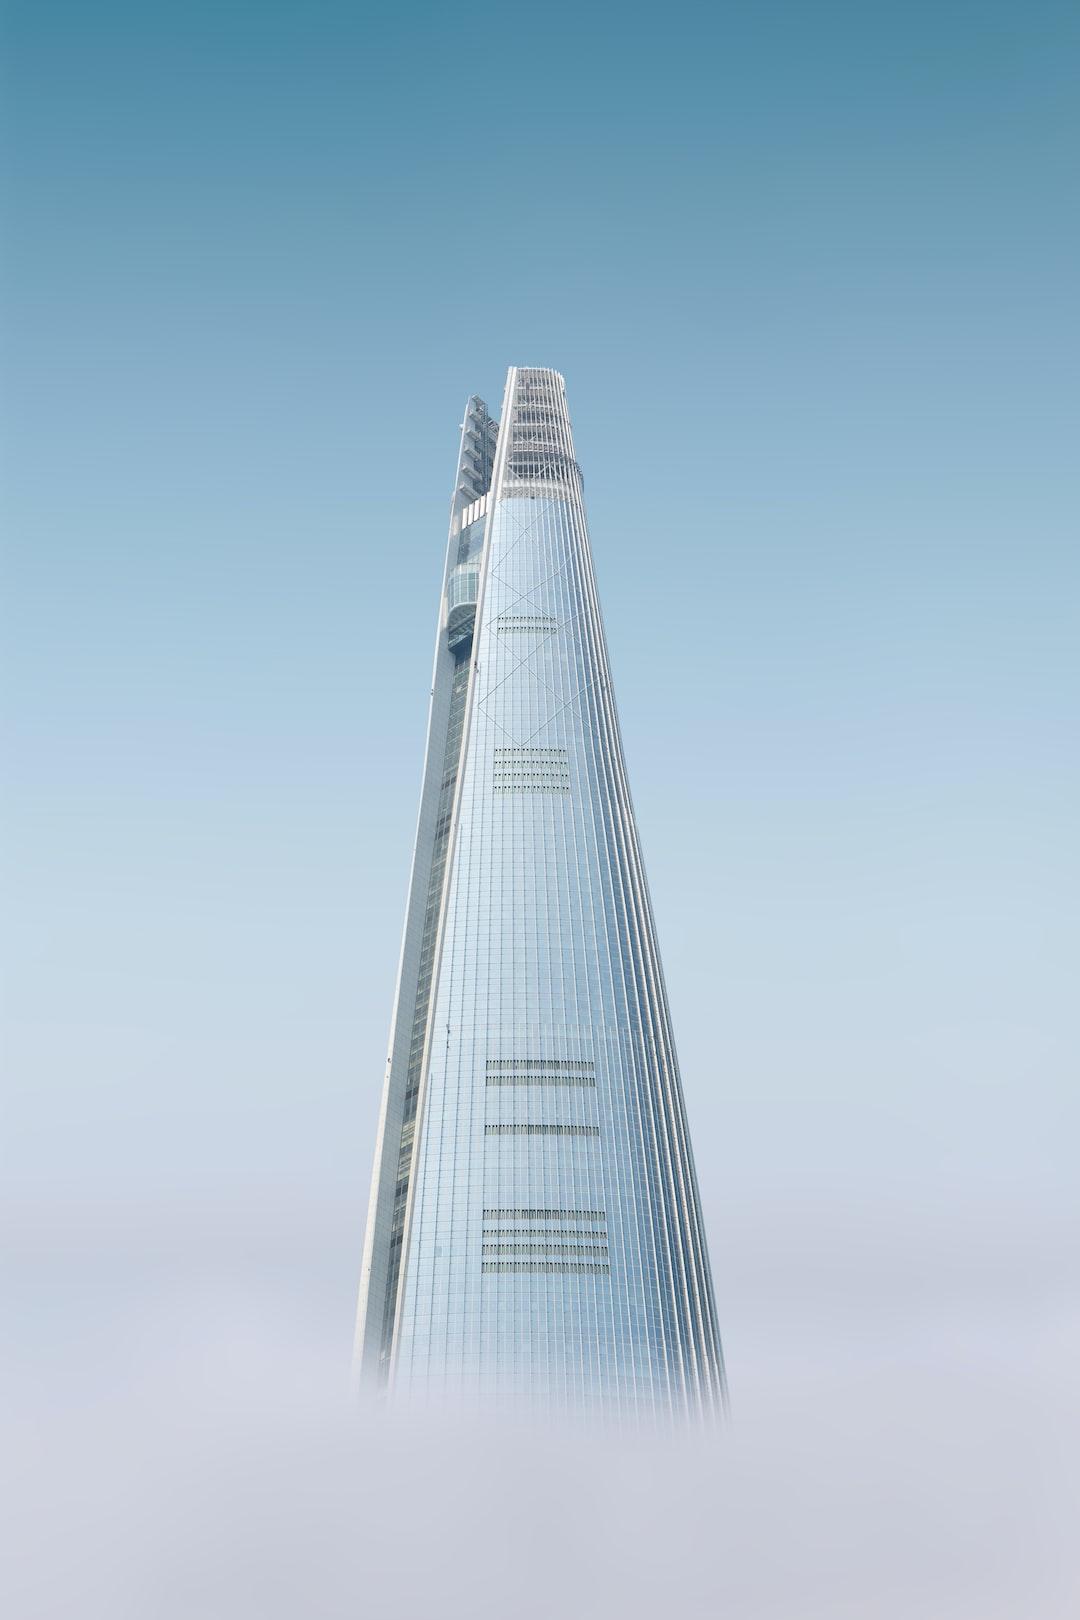 Lotte Tower 5XXm high